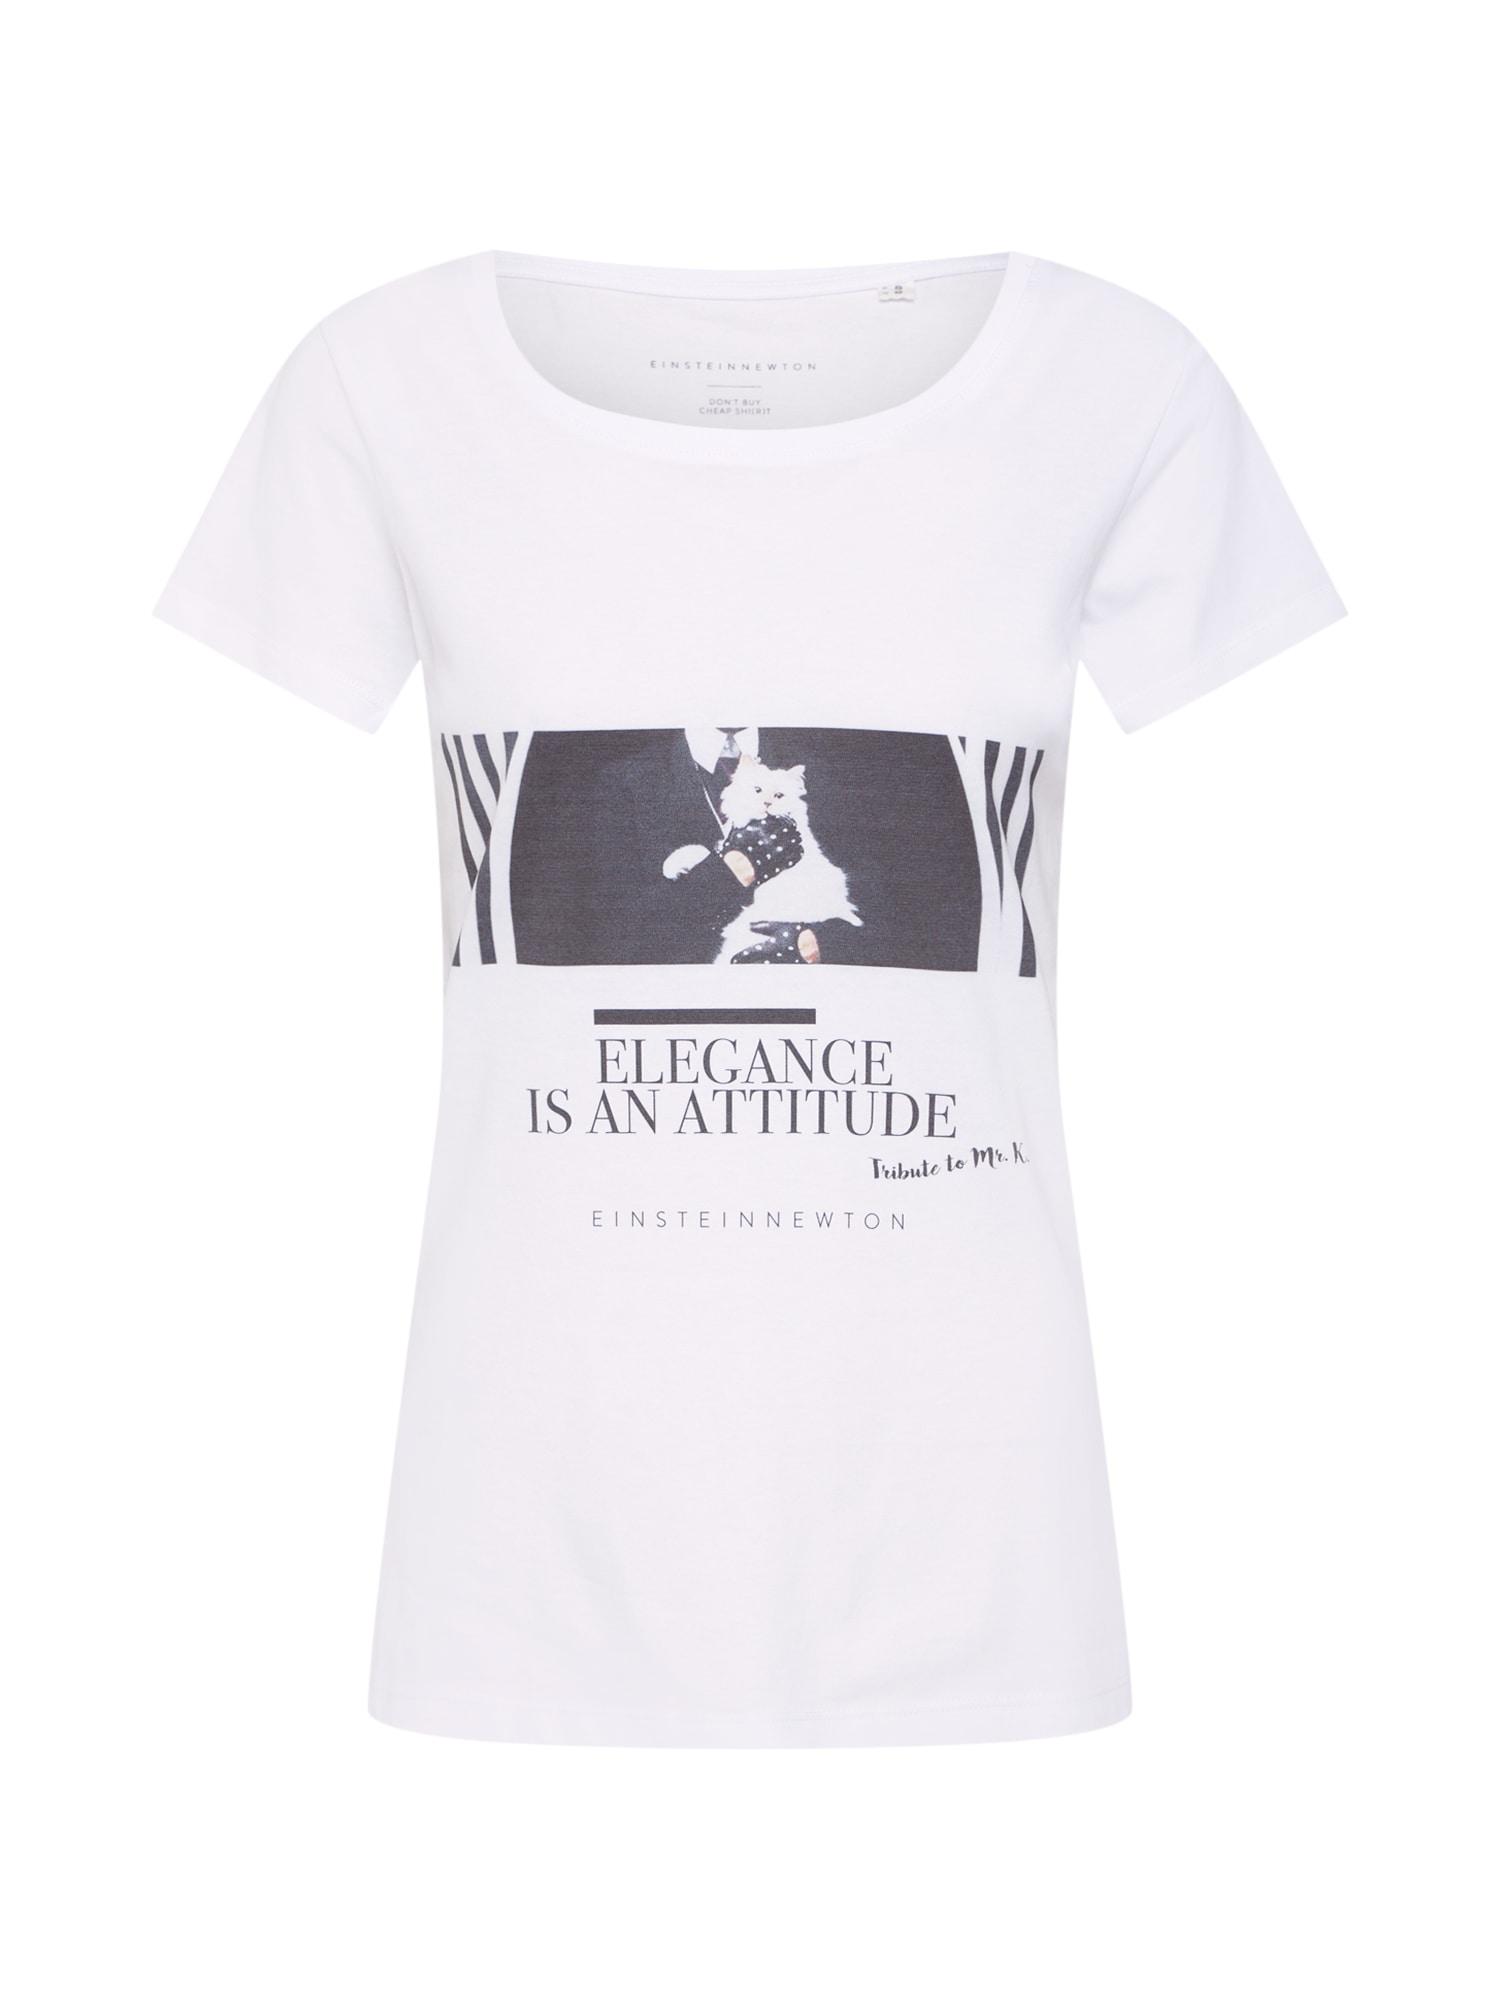 Tričko bílá EINSTEIN & NEWTON